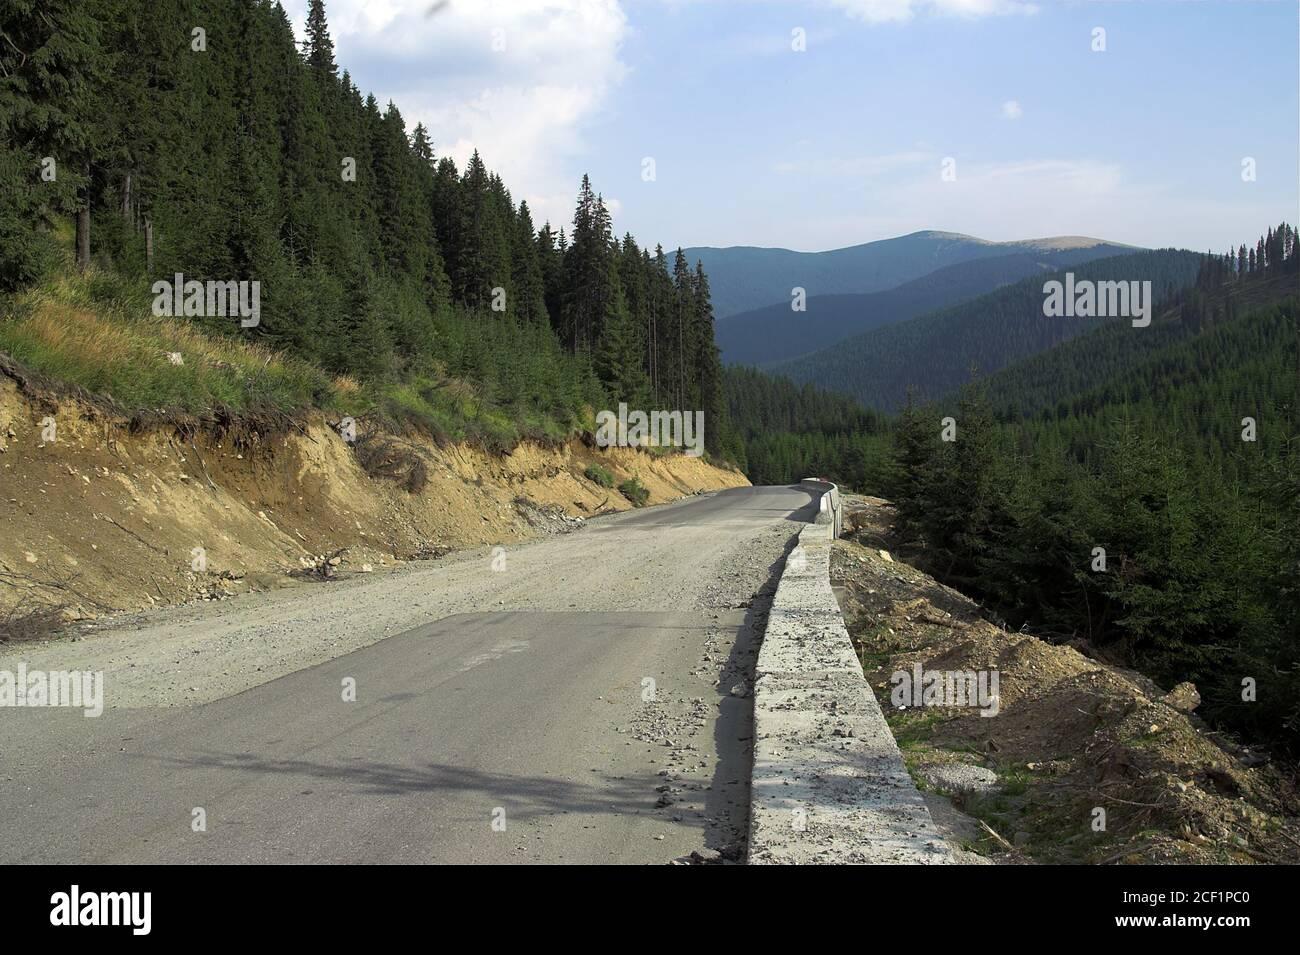 Romania, Carpathians, the road among green hills. Rumänien, Karpaten, die Straße zwischen grünen Hügeln. Cárpatos, el camino entre verdes colinas. Stock Photo